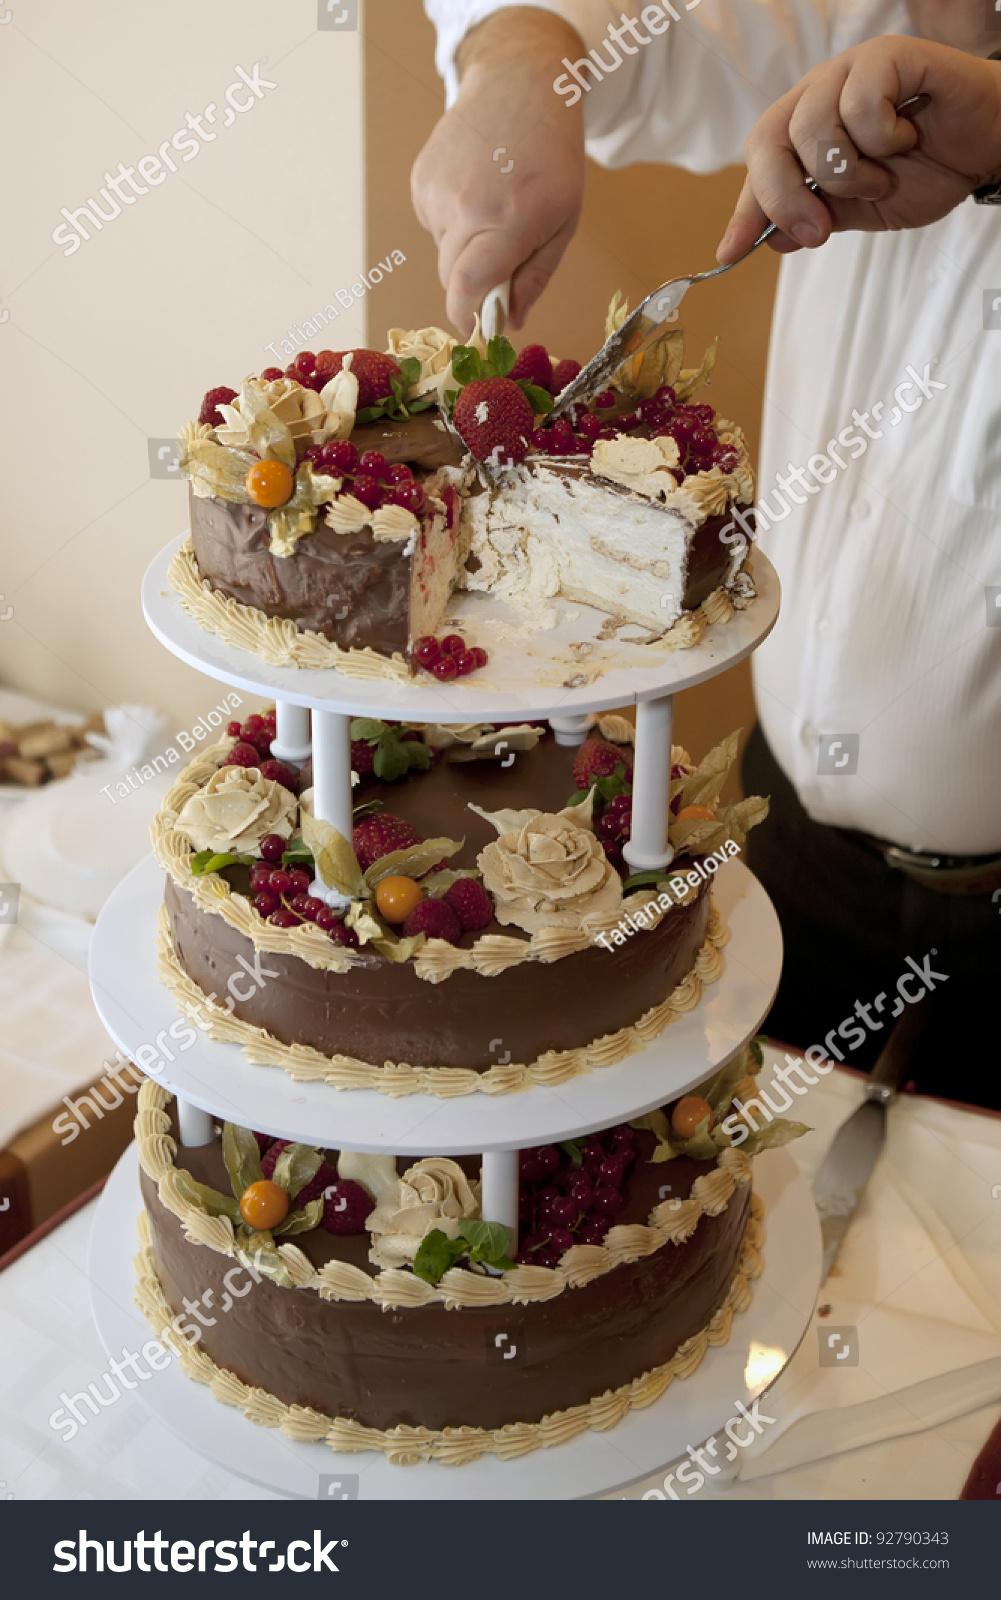 A Luxury Birthday Cake Being Cut Stock Photo 92790343